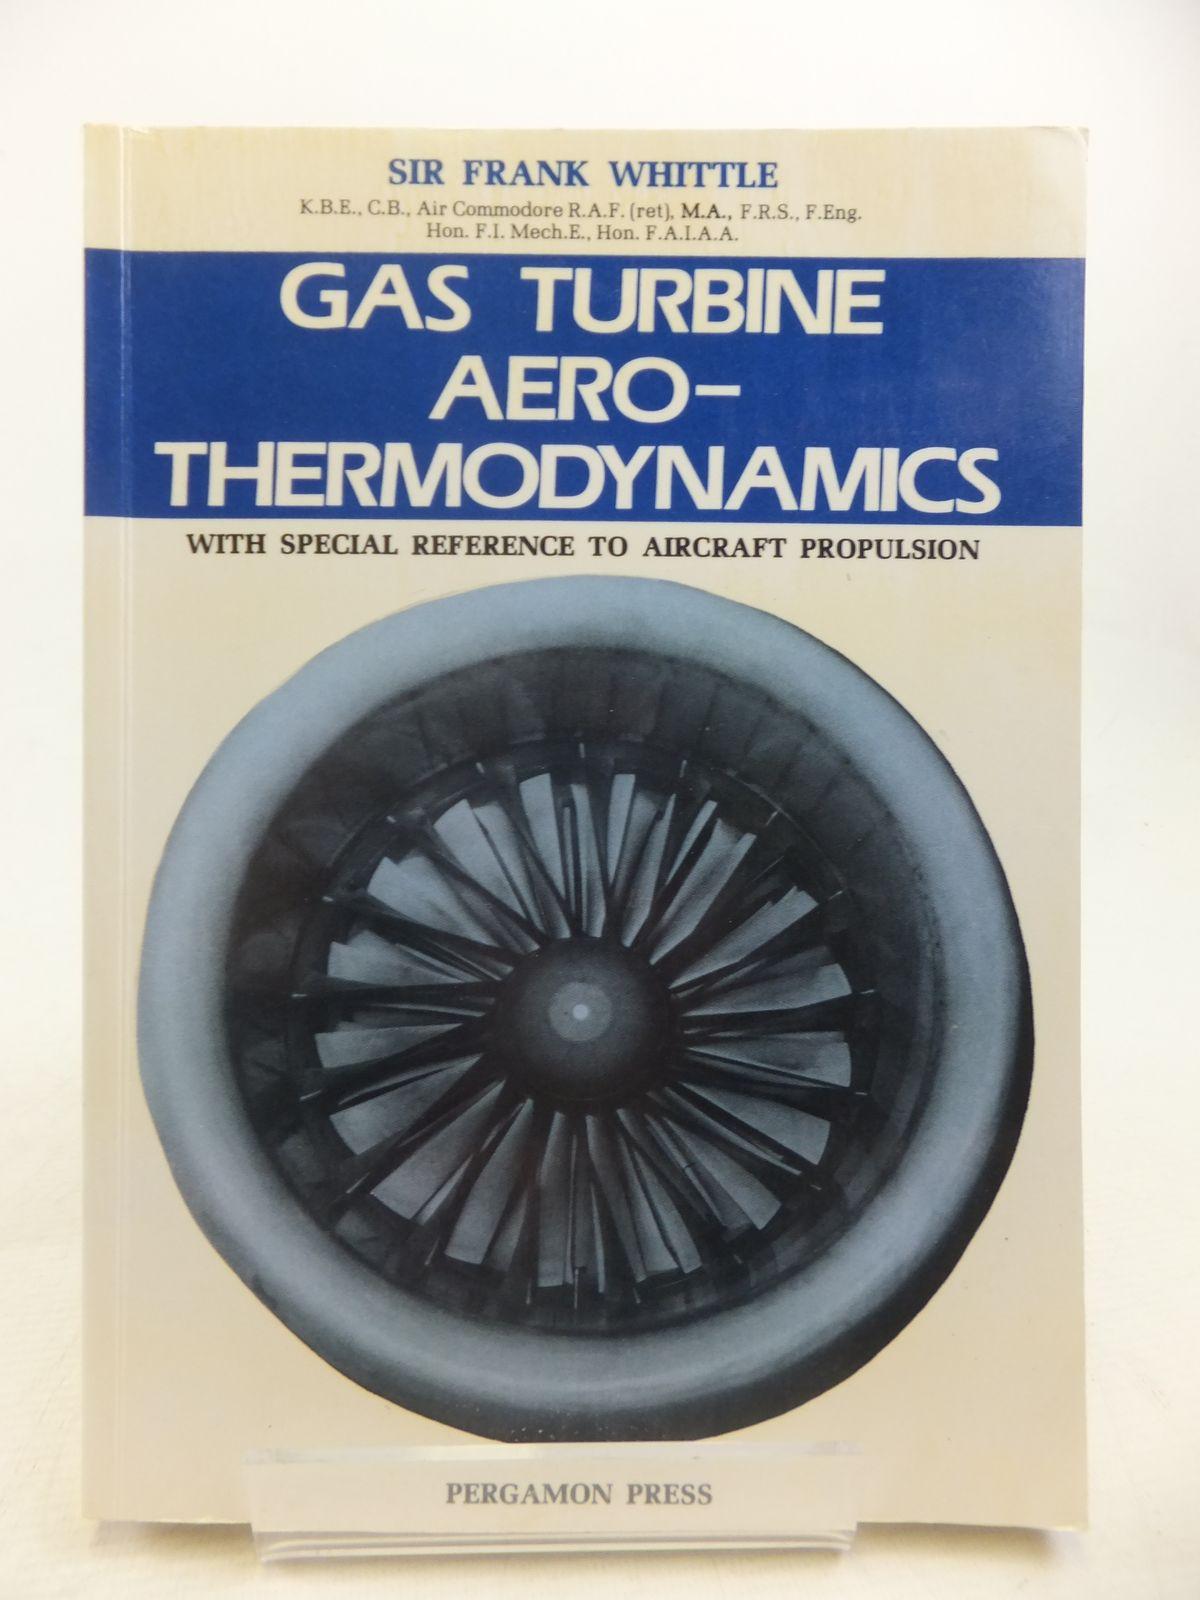 GAS TURBINE AERO THERMODYNAMICS written by Whittle Frank STOCK